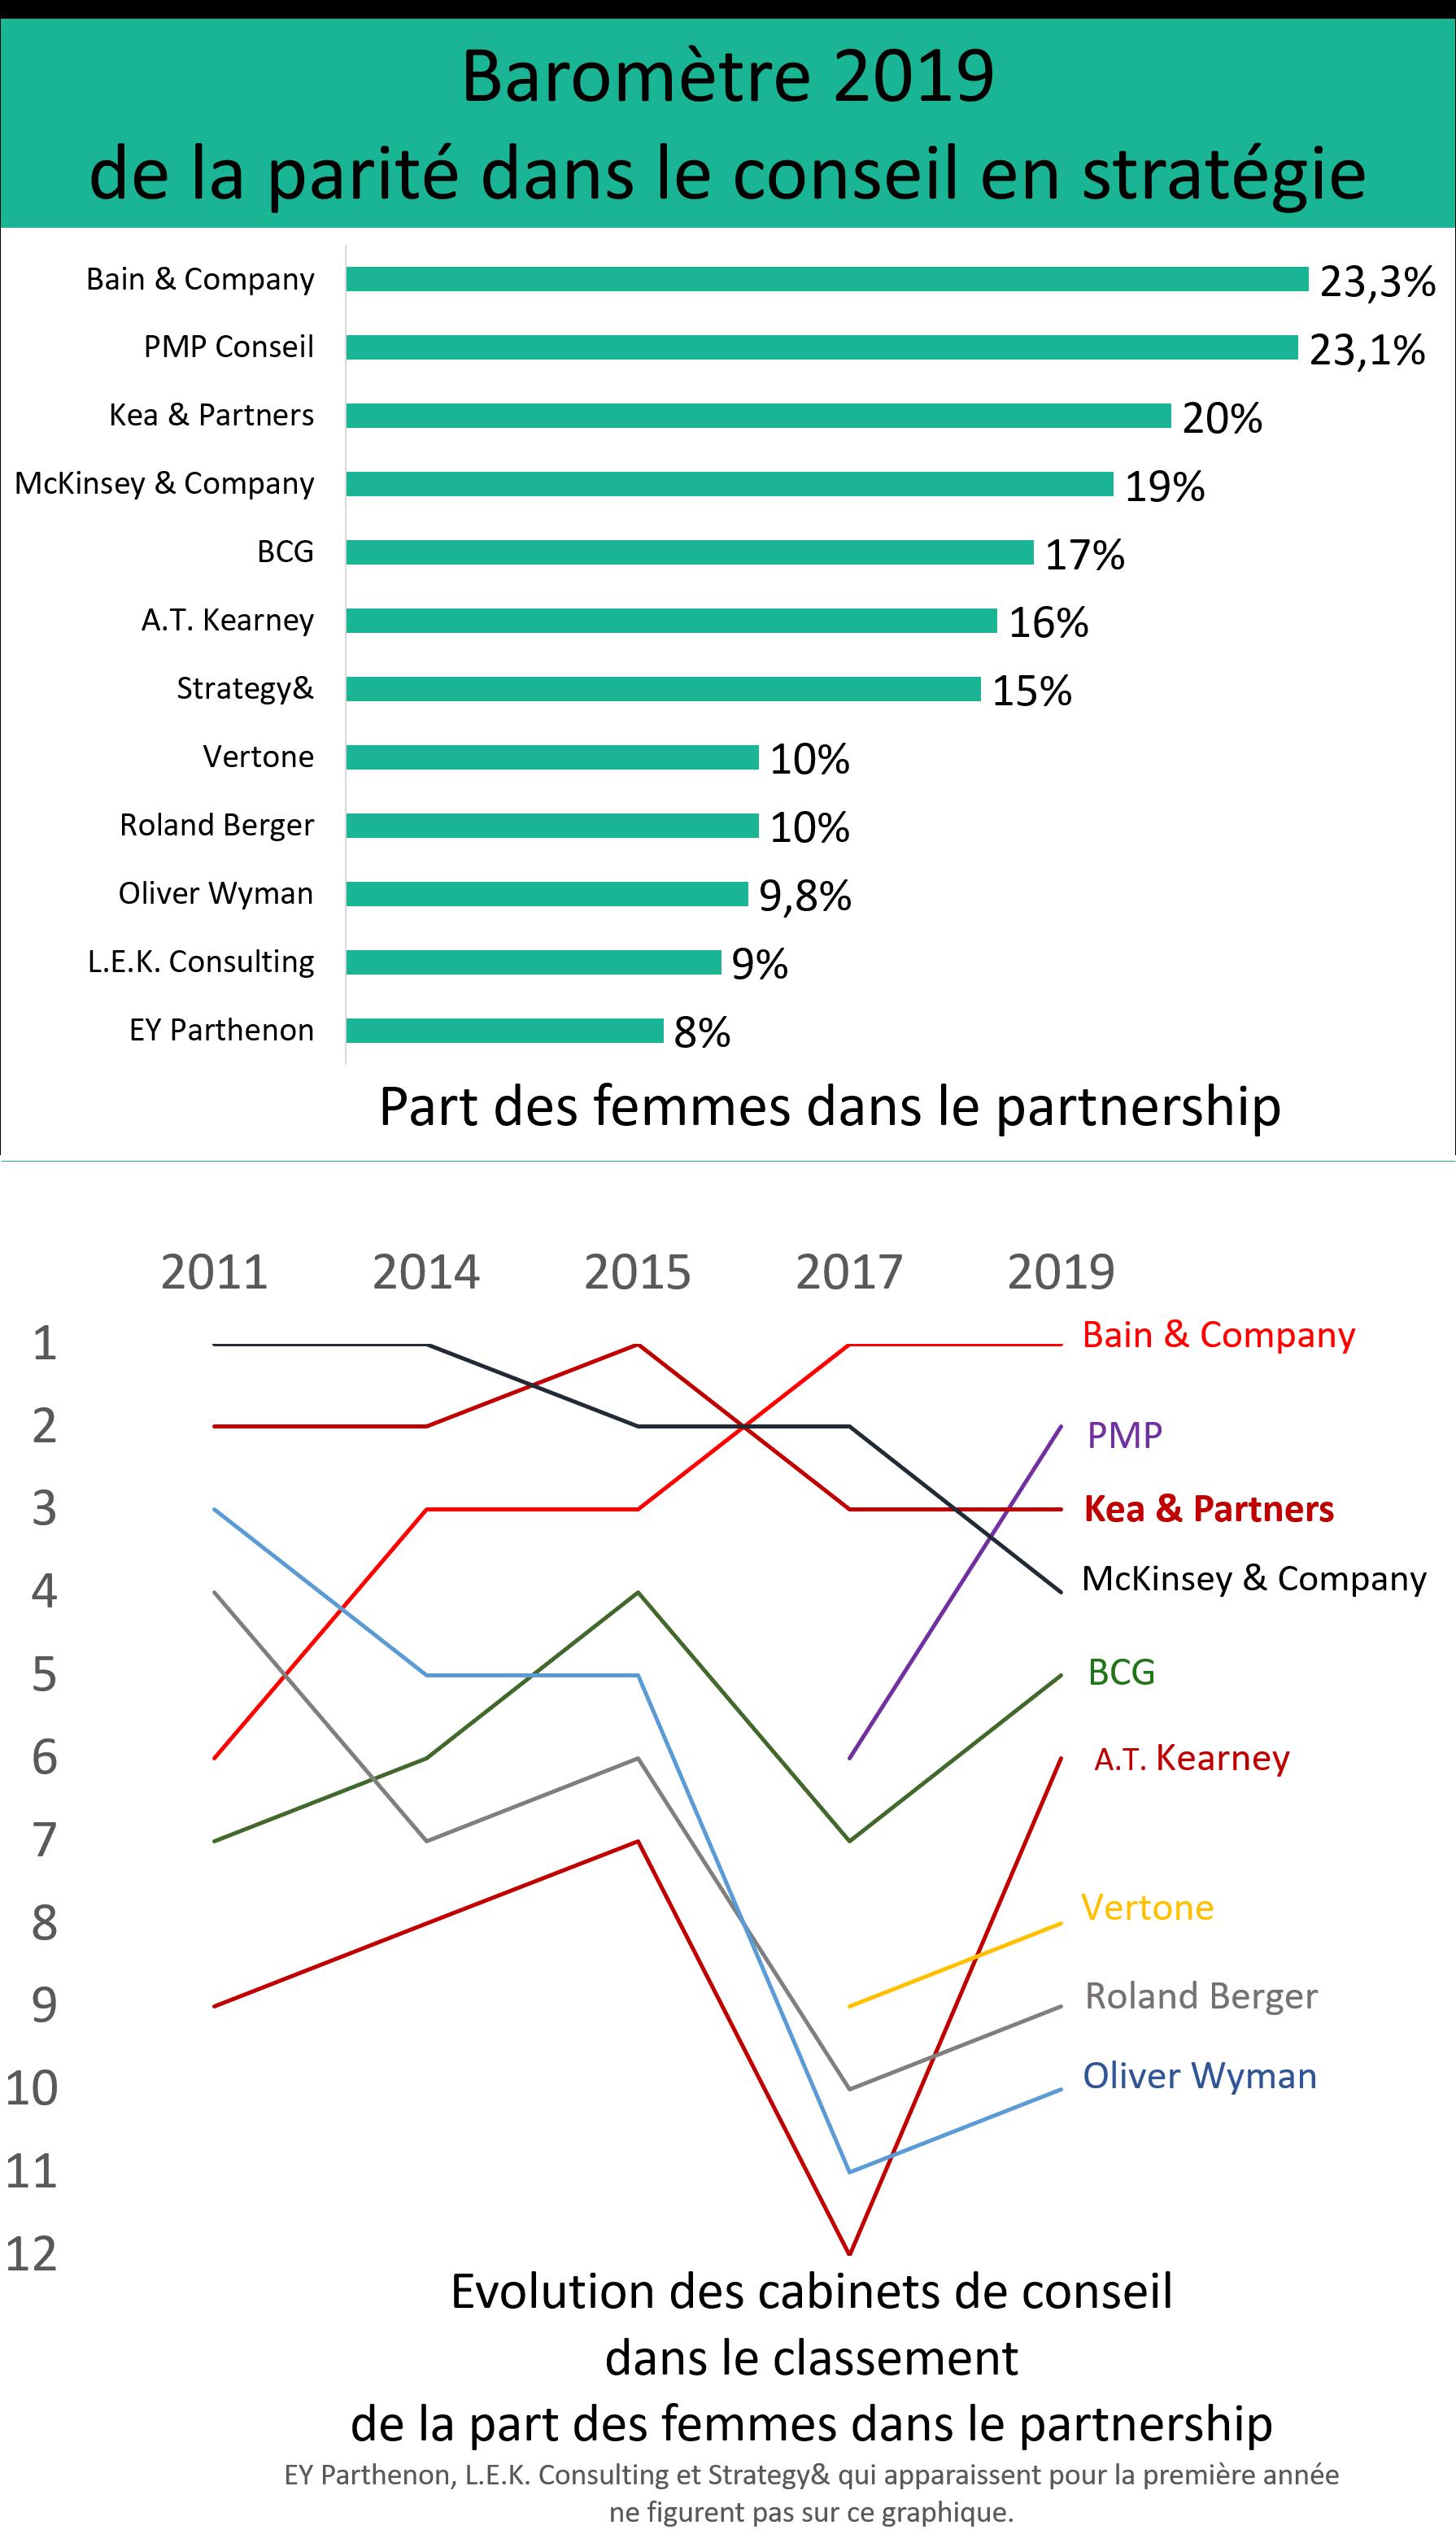 Barometre 2019 Consultor parite